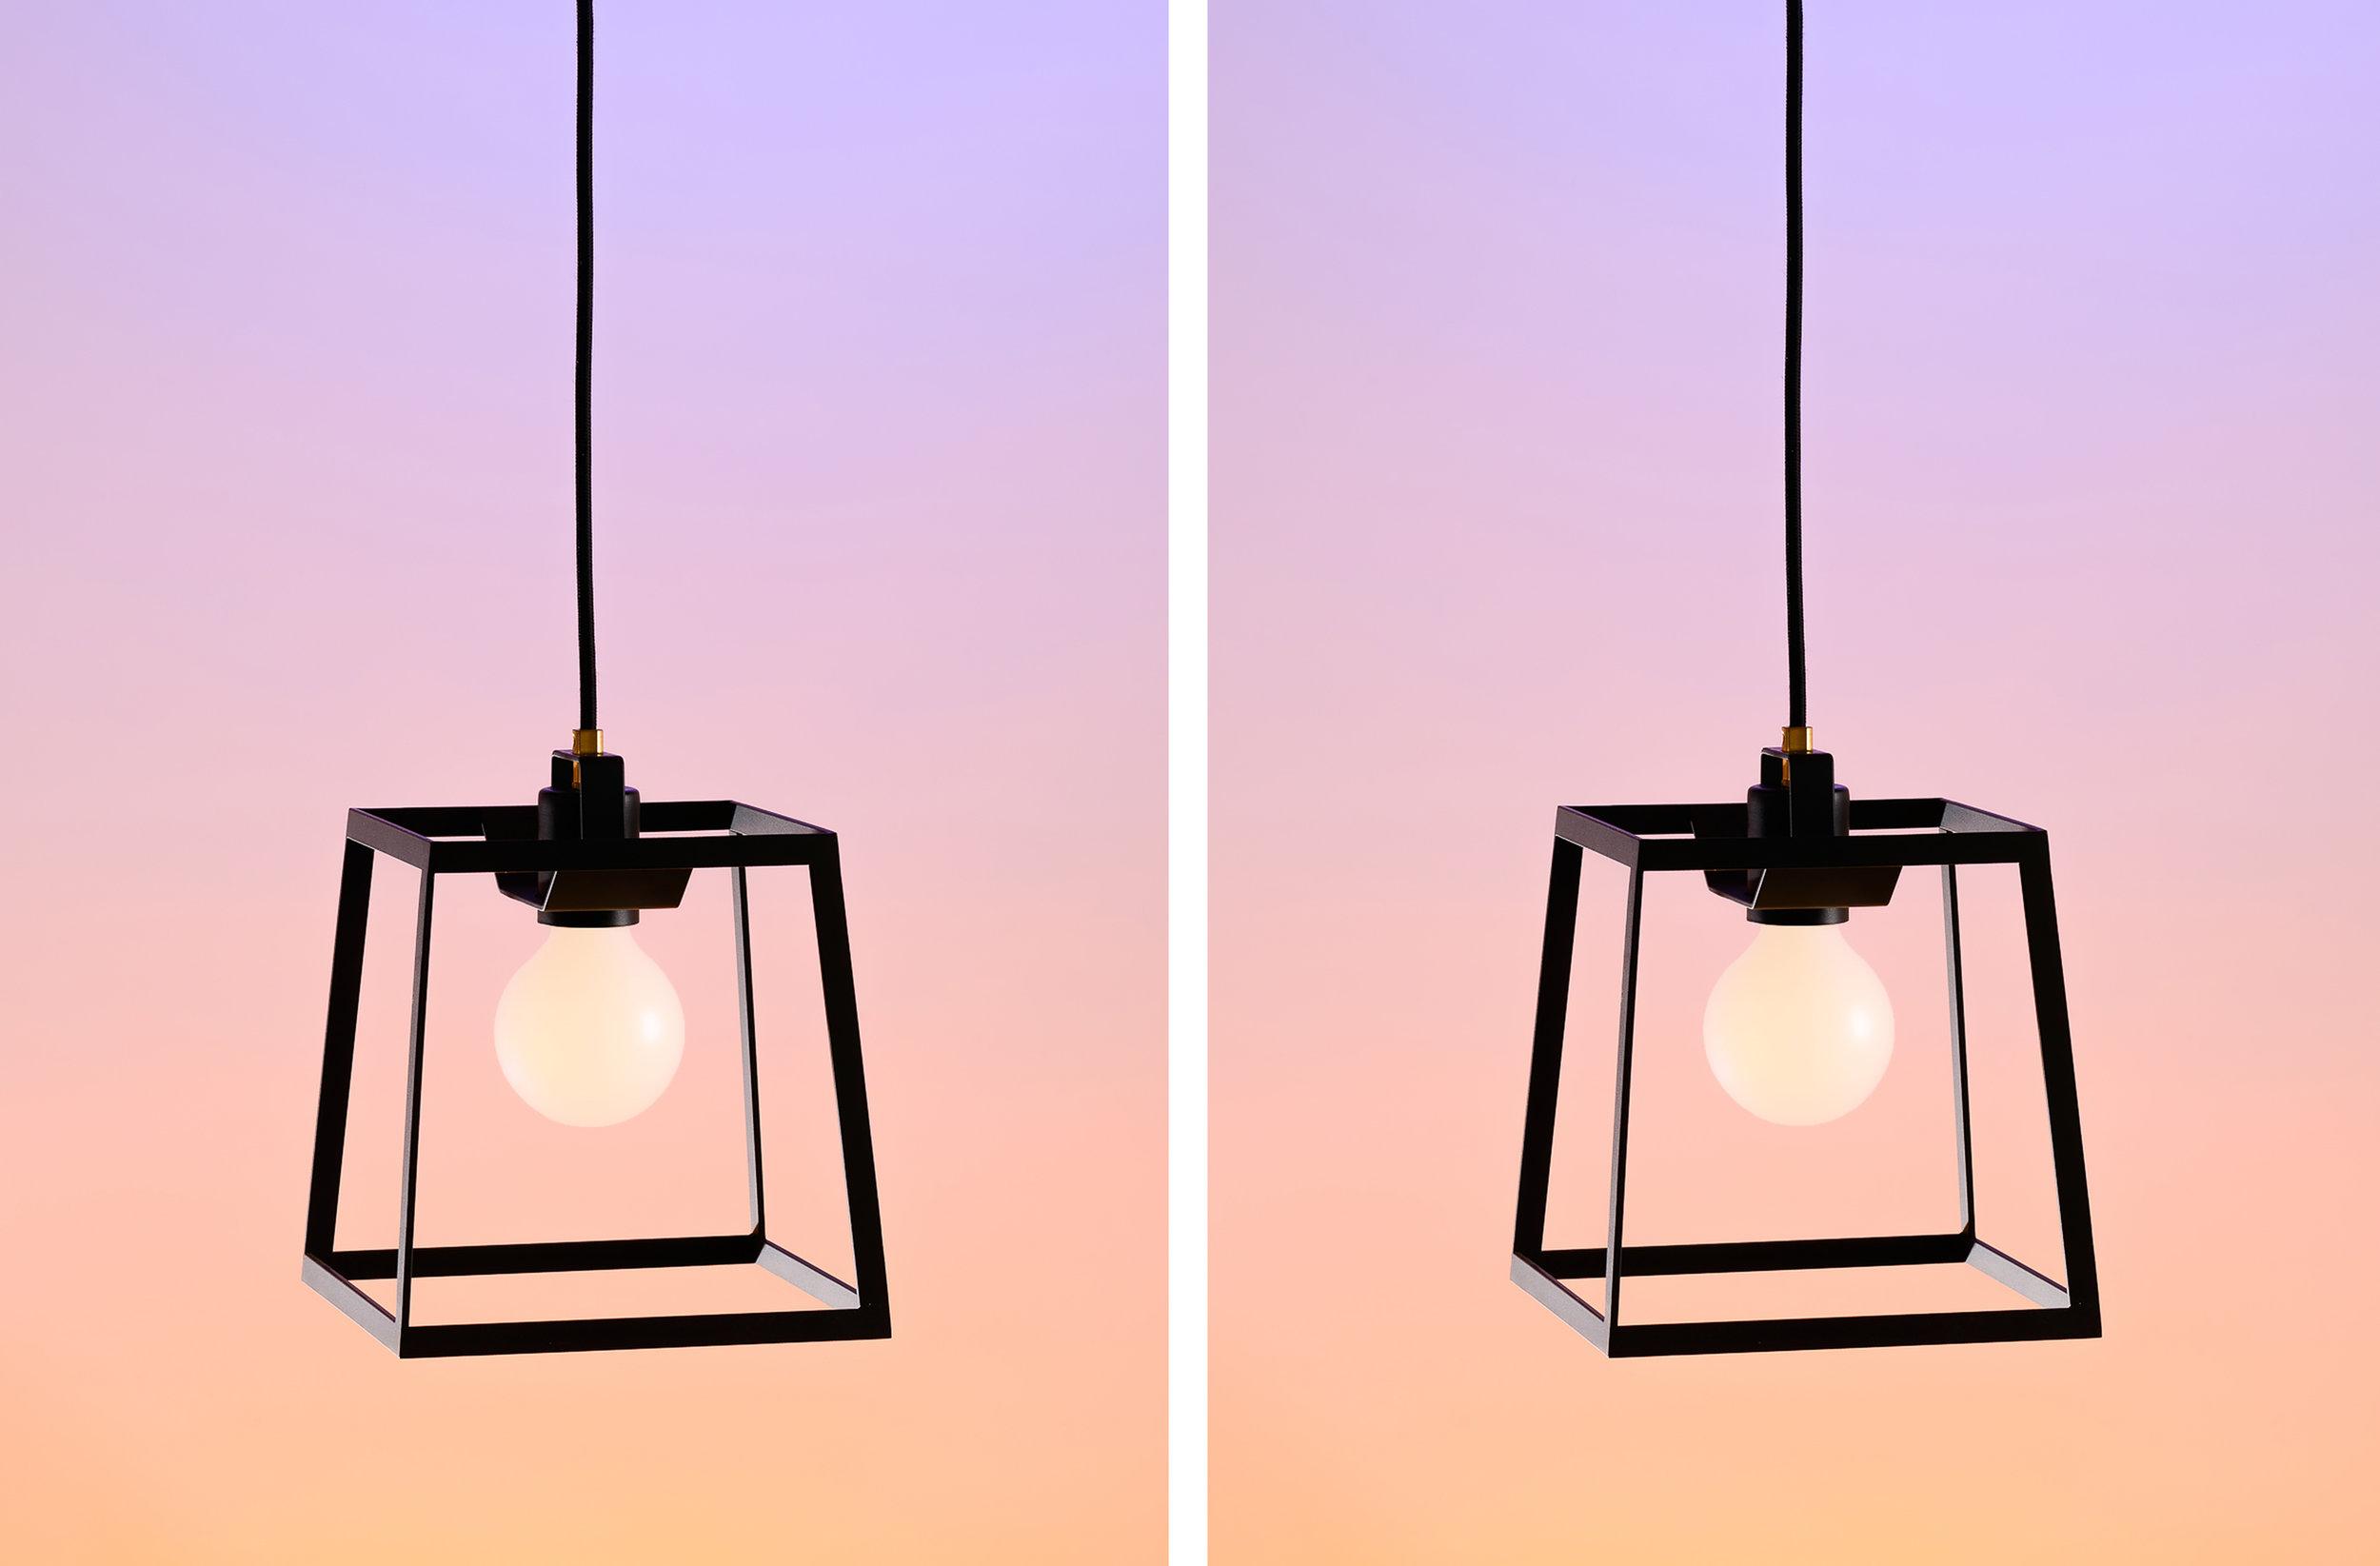 Small Frame Light / Photo by Amanda Ringstad